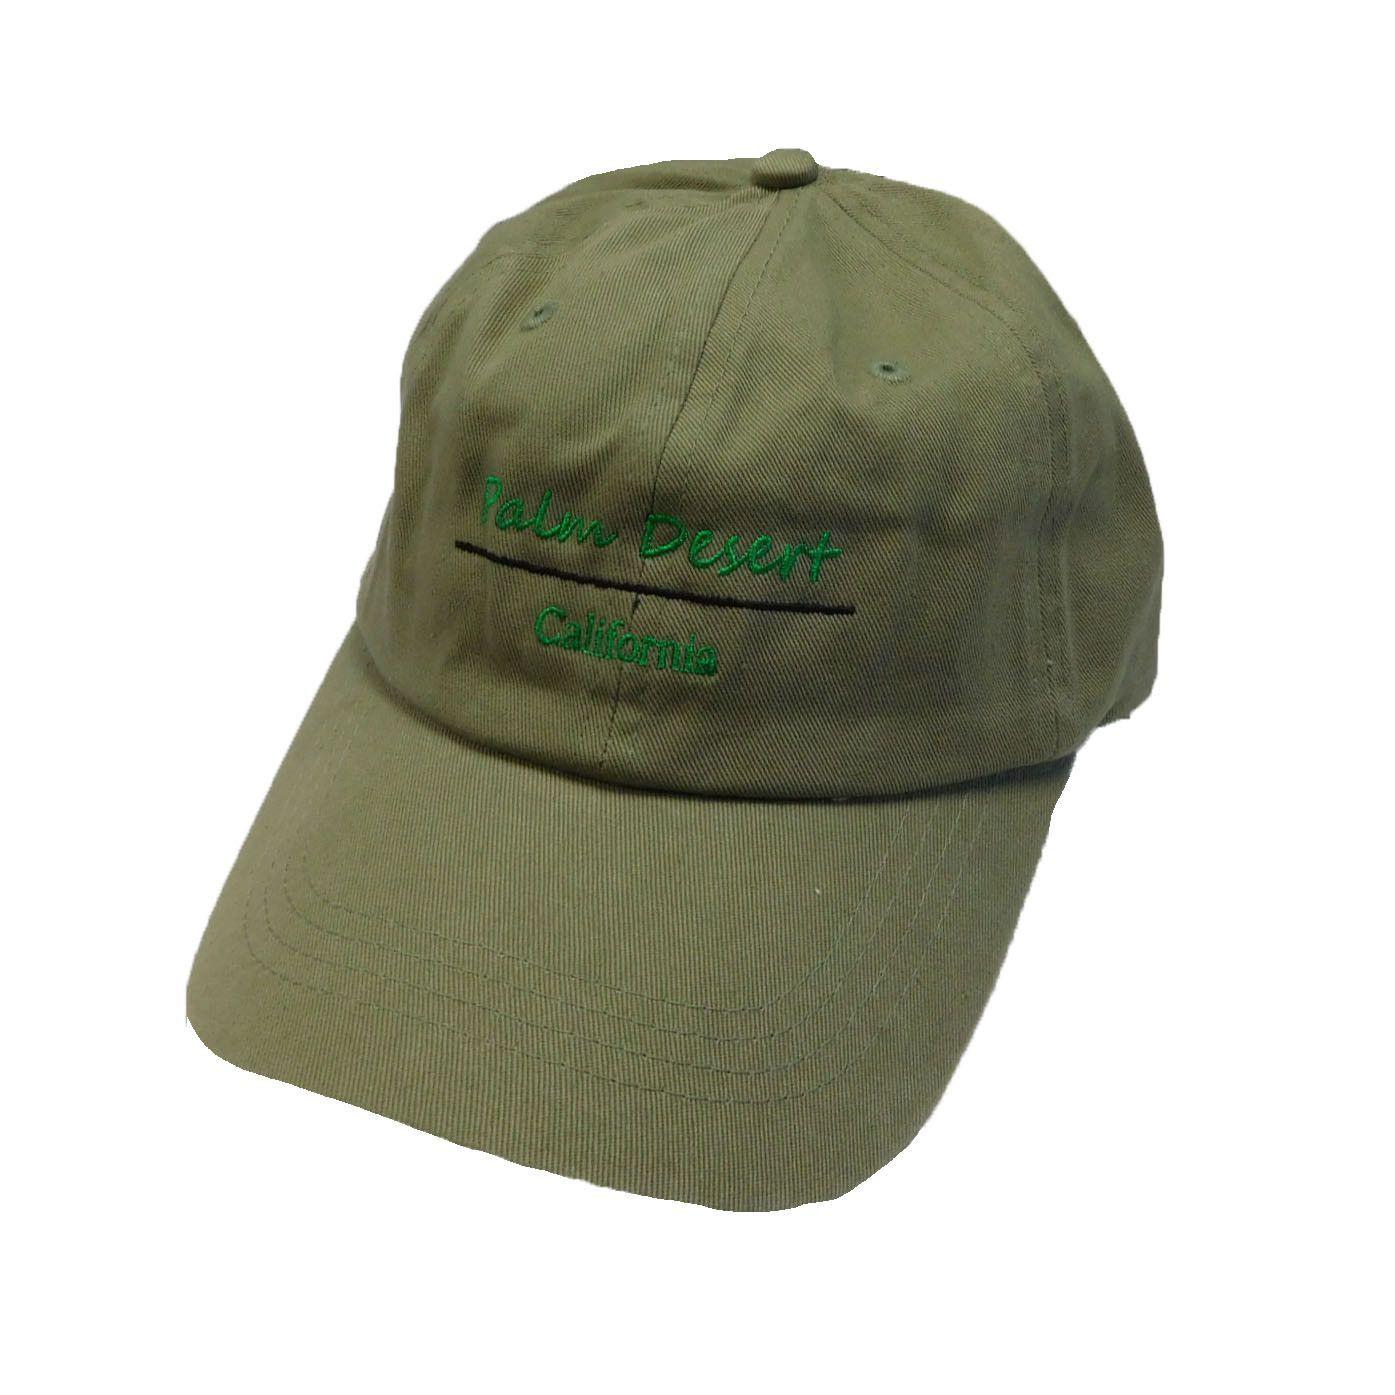 69d960ab08f Twill Baseball Cap - Olive